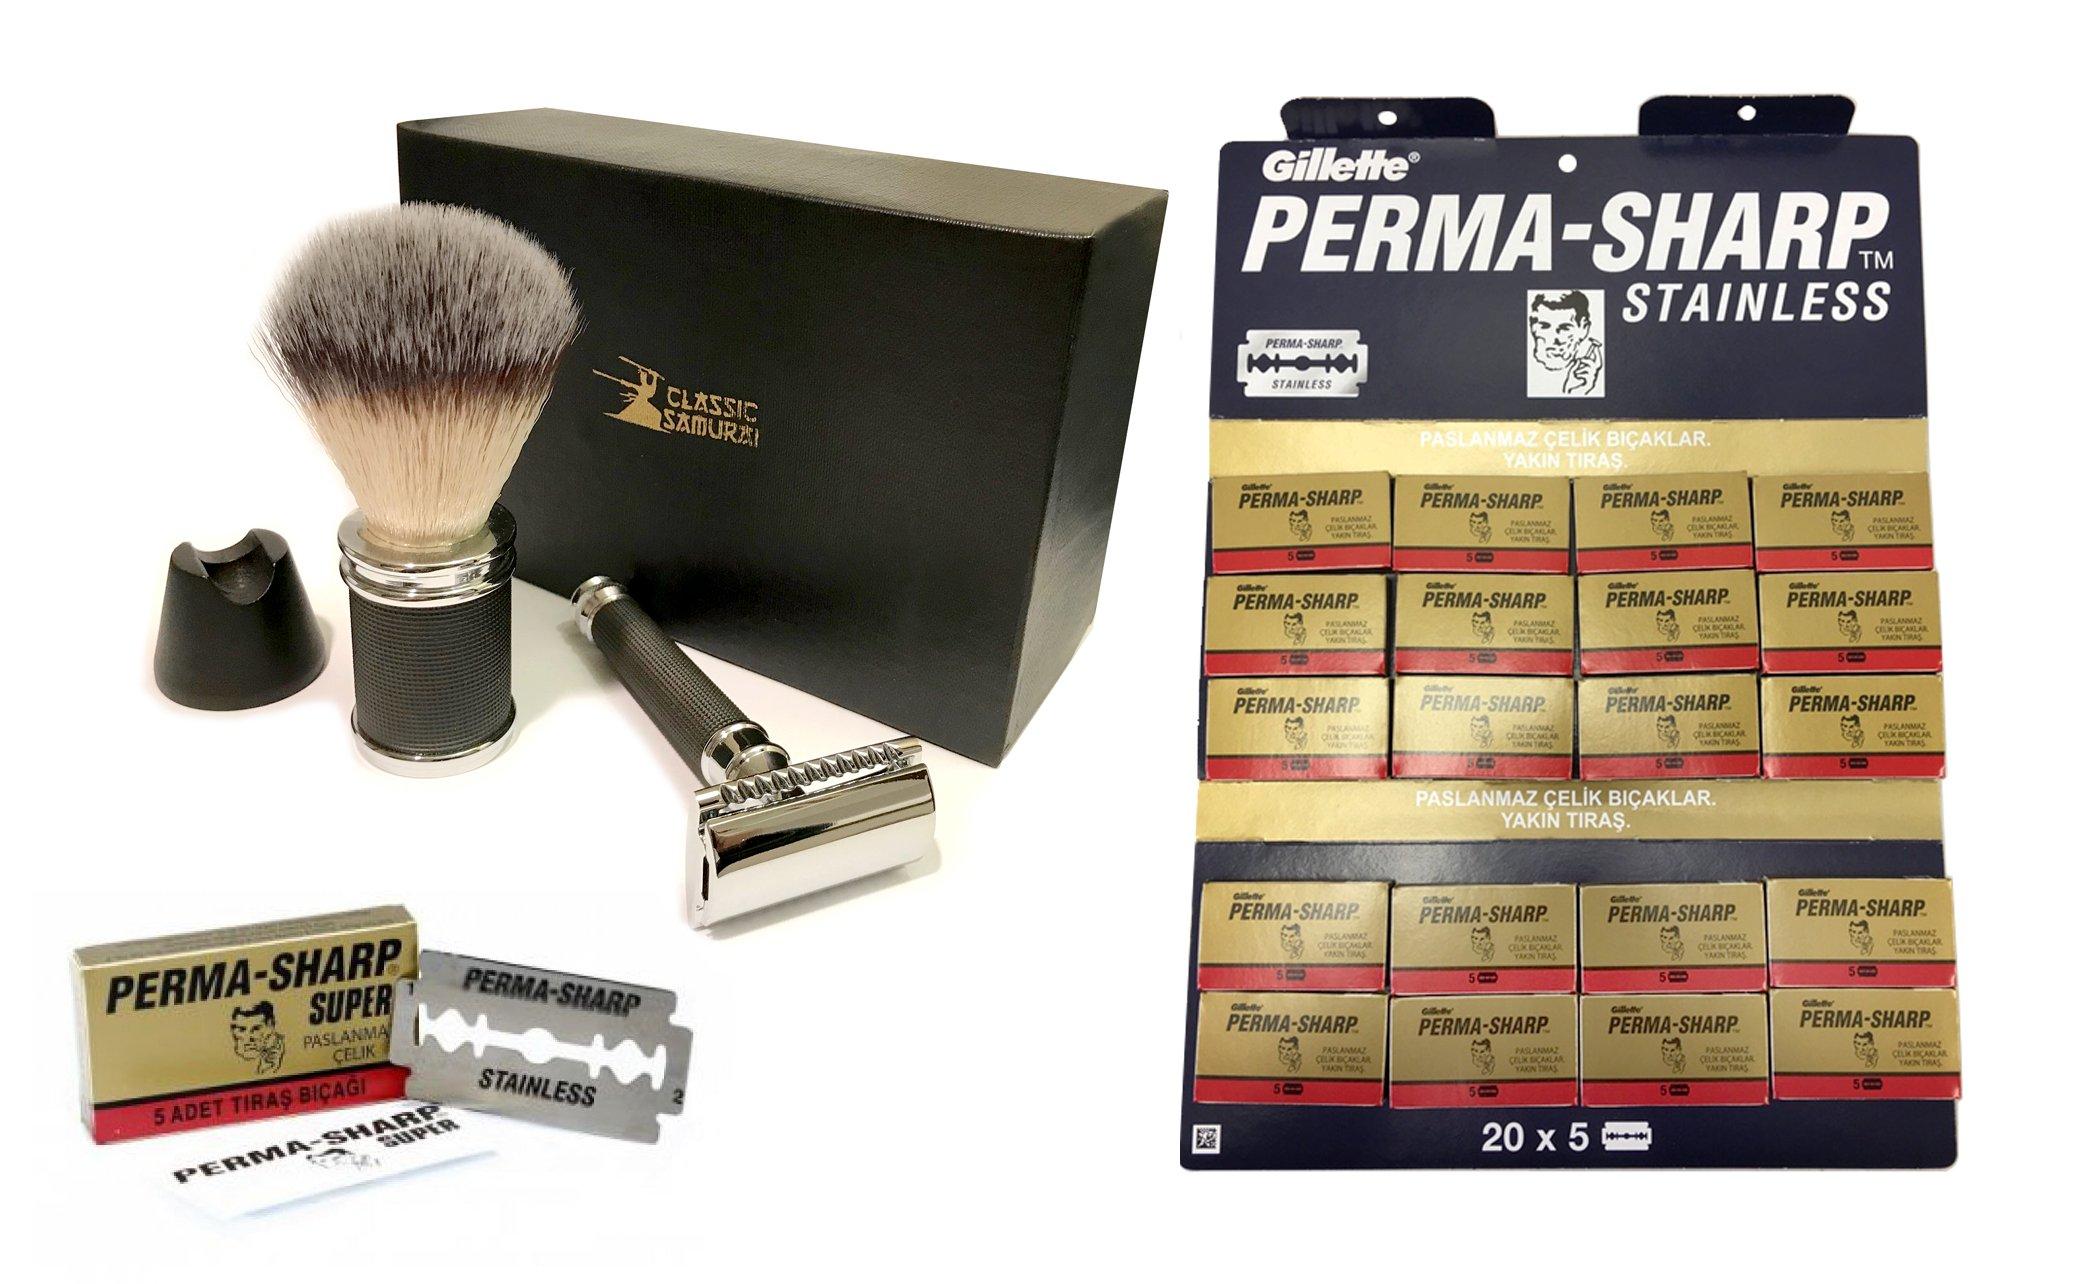 Classic Samurai Men's Shaving Set, Safety Razor,Shaving Brush, Stand & 100 Perma-Sharp Blades